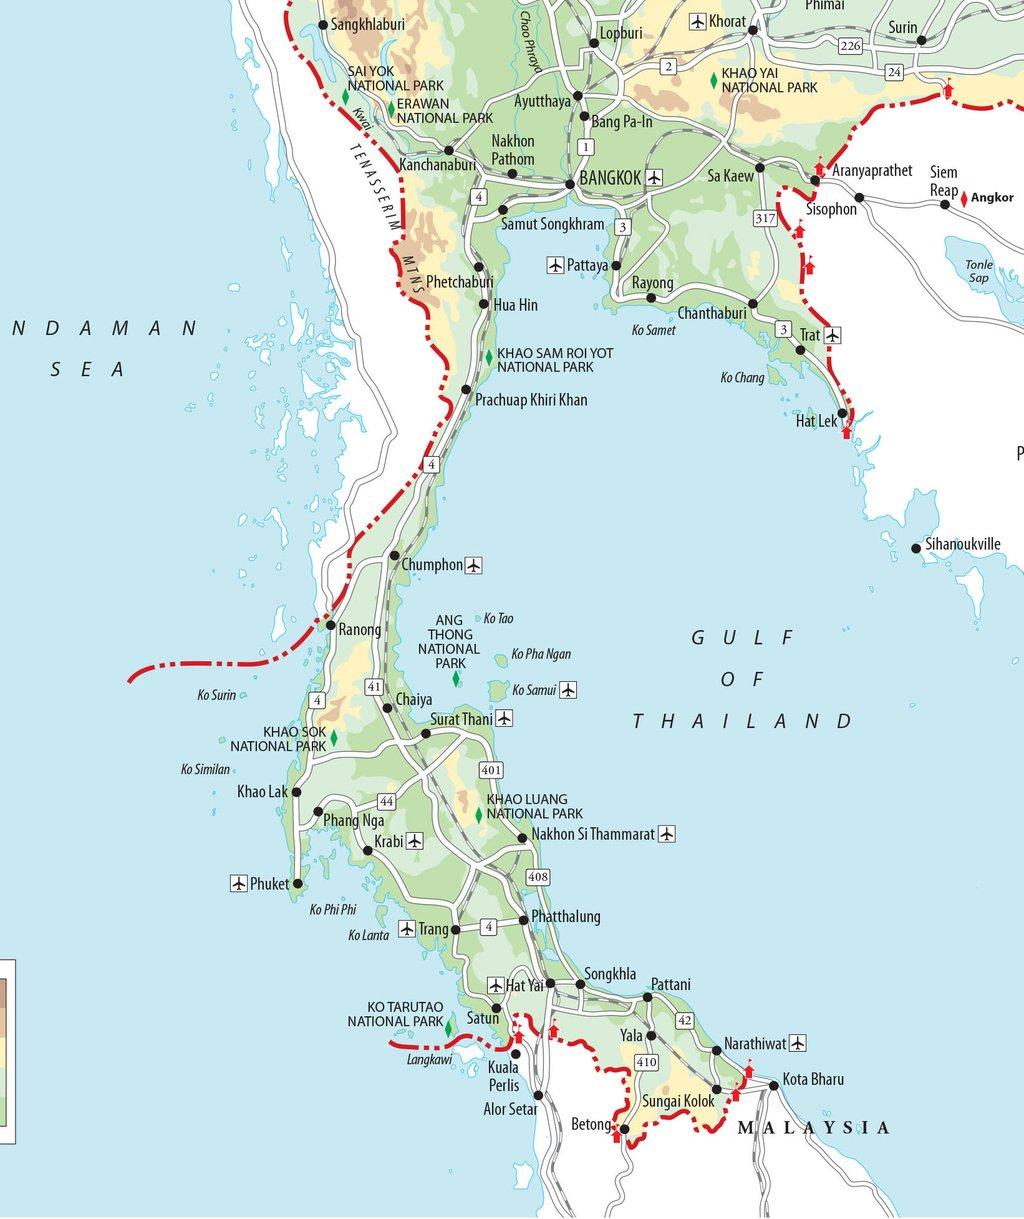 The Best Thailand Islands | Best Thai Islands | Rough Guides Bangkok Thailand Map Of Islands on map of thailand showing cities, map of island of koh tao thailand, map of bangkok neighborhoods, map of thailand provinces bangkok, map of krabi island thailand, map of thailand beaches, map of bangkok thailand cities, map of thailand google search, map of bangkok in english, map of bangkok and activities, map bahamas caribbean islands, map of wat pho in bangkok, map of bangkok thailand hotels, map of bangkok nightlife, map of islands in andaman sea thailand, koh phangan map thailand islands, map of bkk, map of mactan island cebu, detailed map of thailand islands, map of jomtien beach thailand,